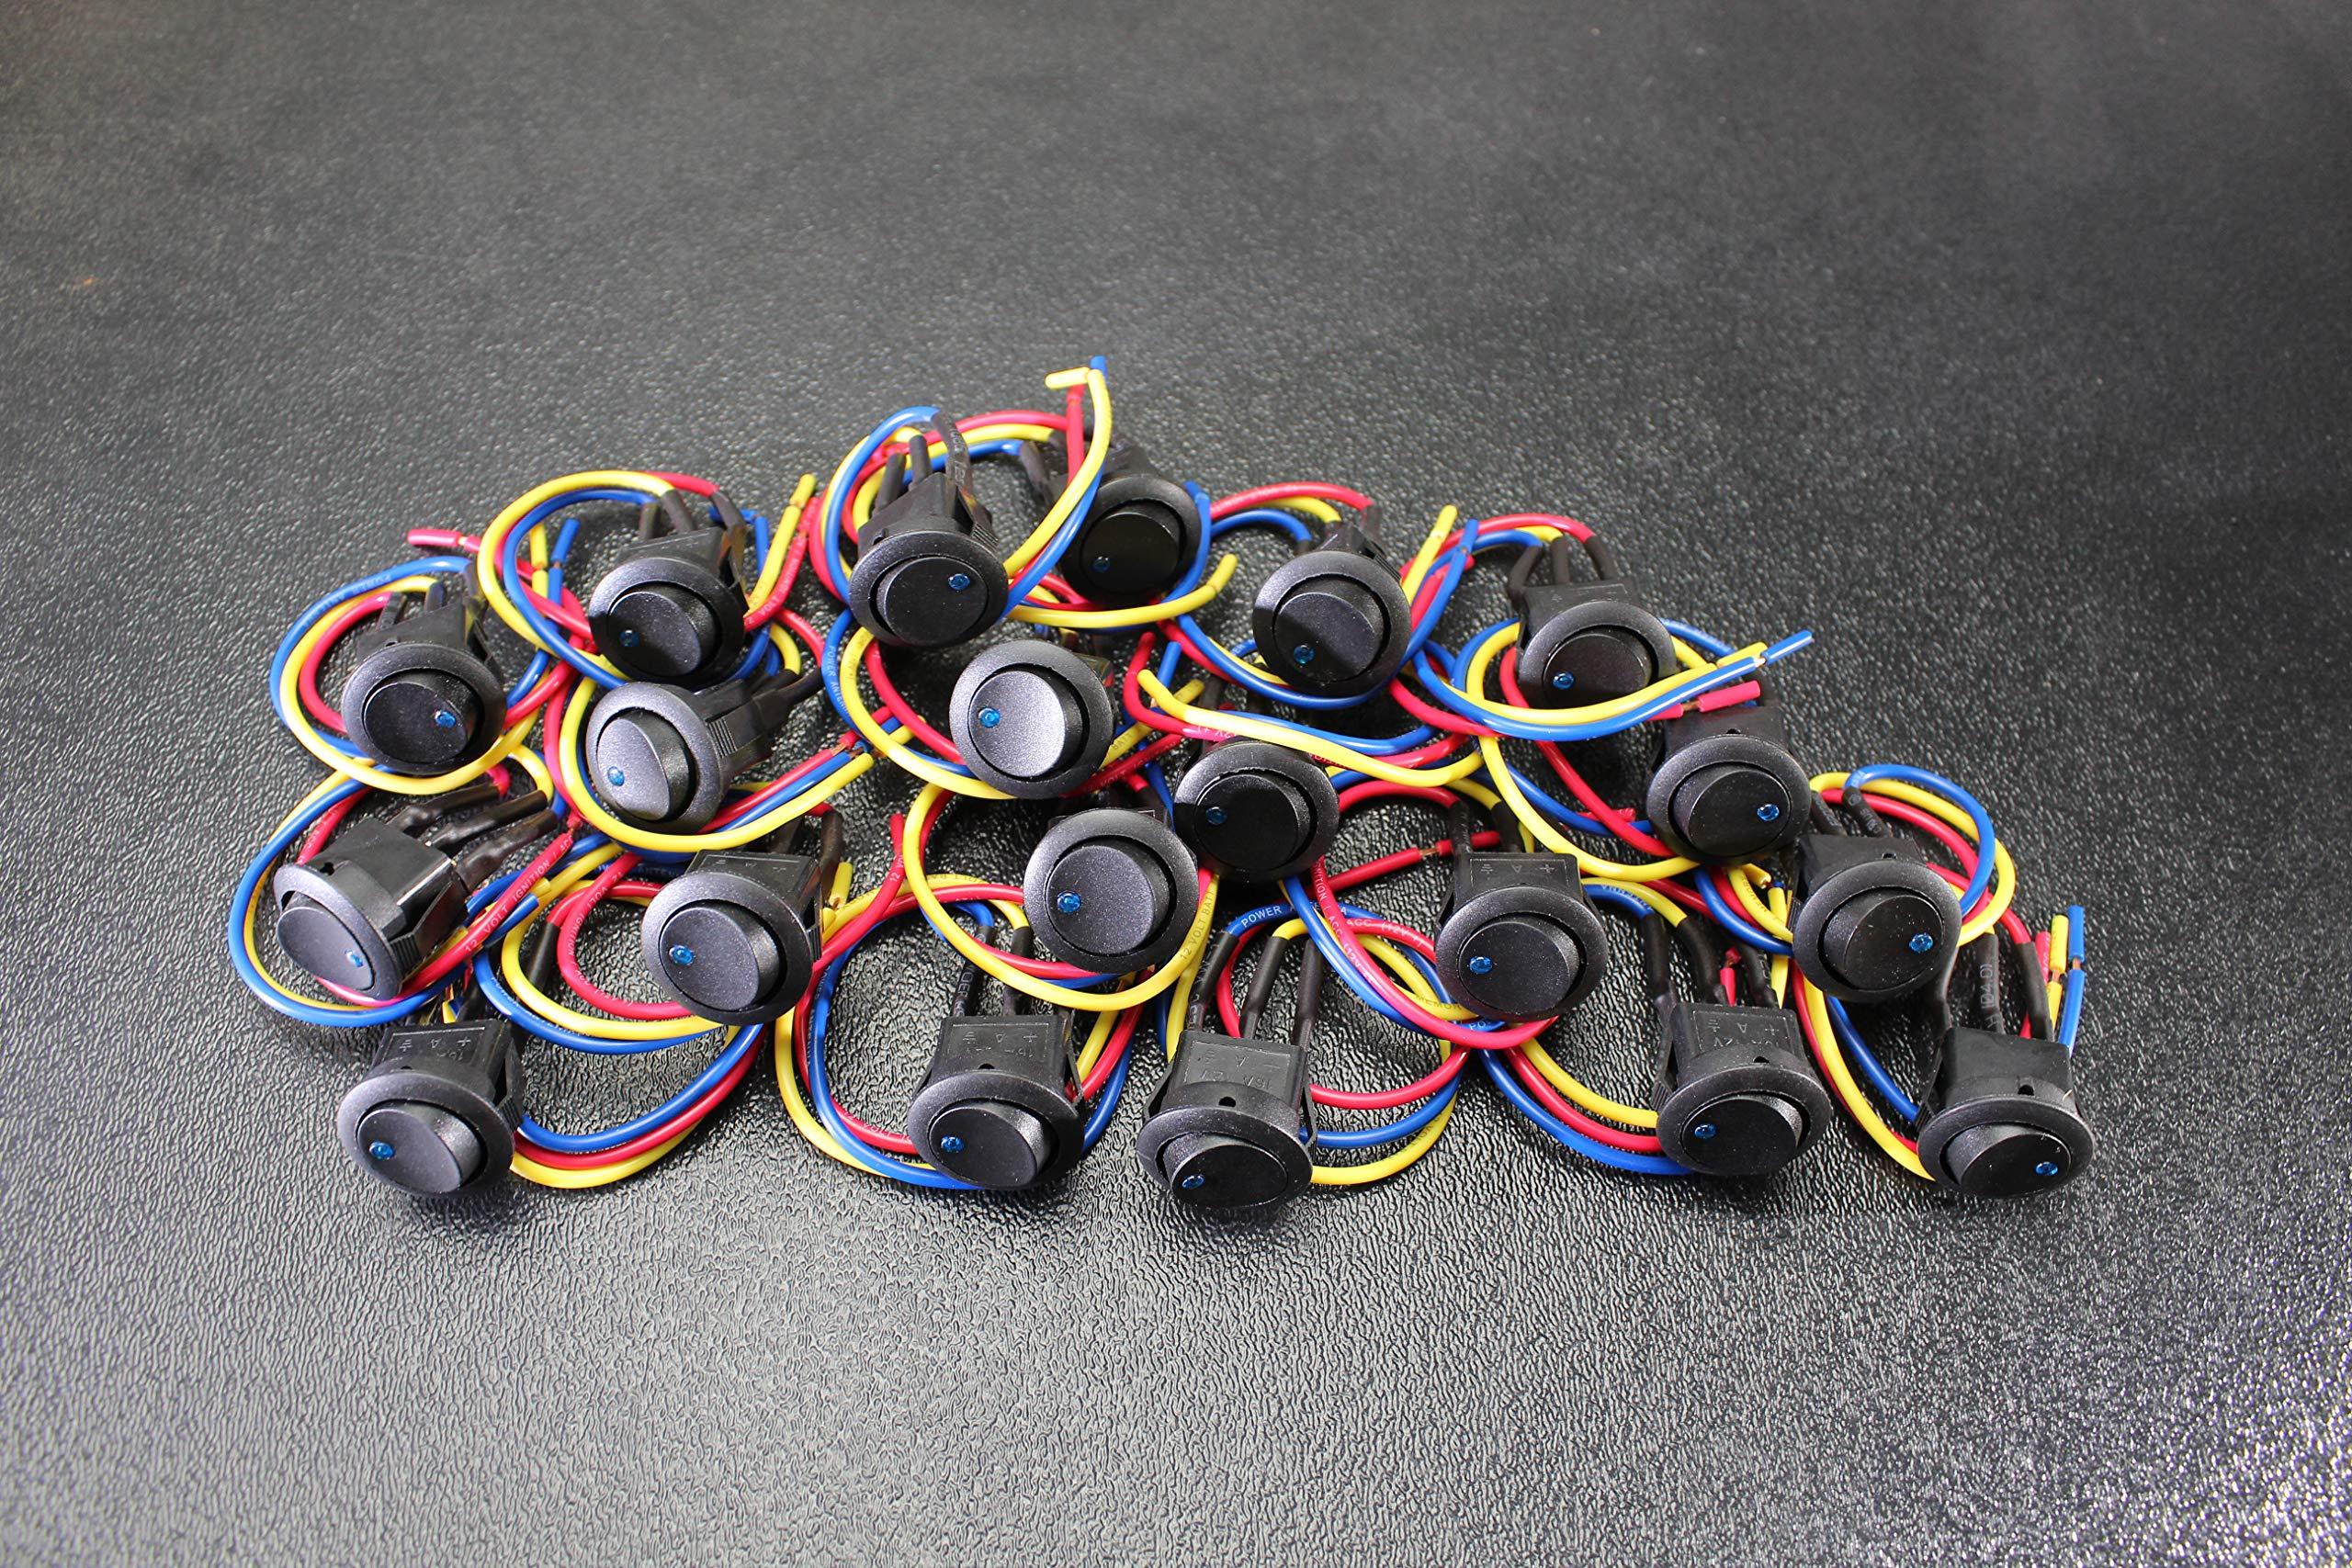 20 PCS Rocker Switch ON Off Blue Toggle LED 12V 16 AMP 3 PIN IS-EC-RS1216BLU by ENNIS ELECTRONICS